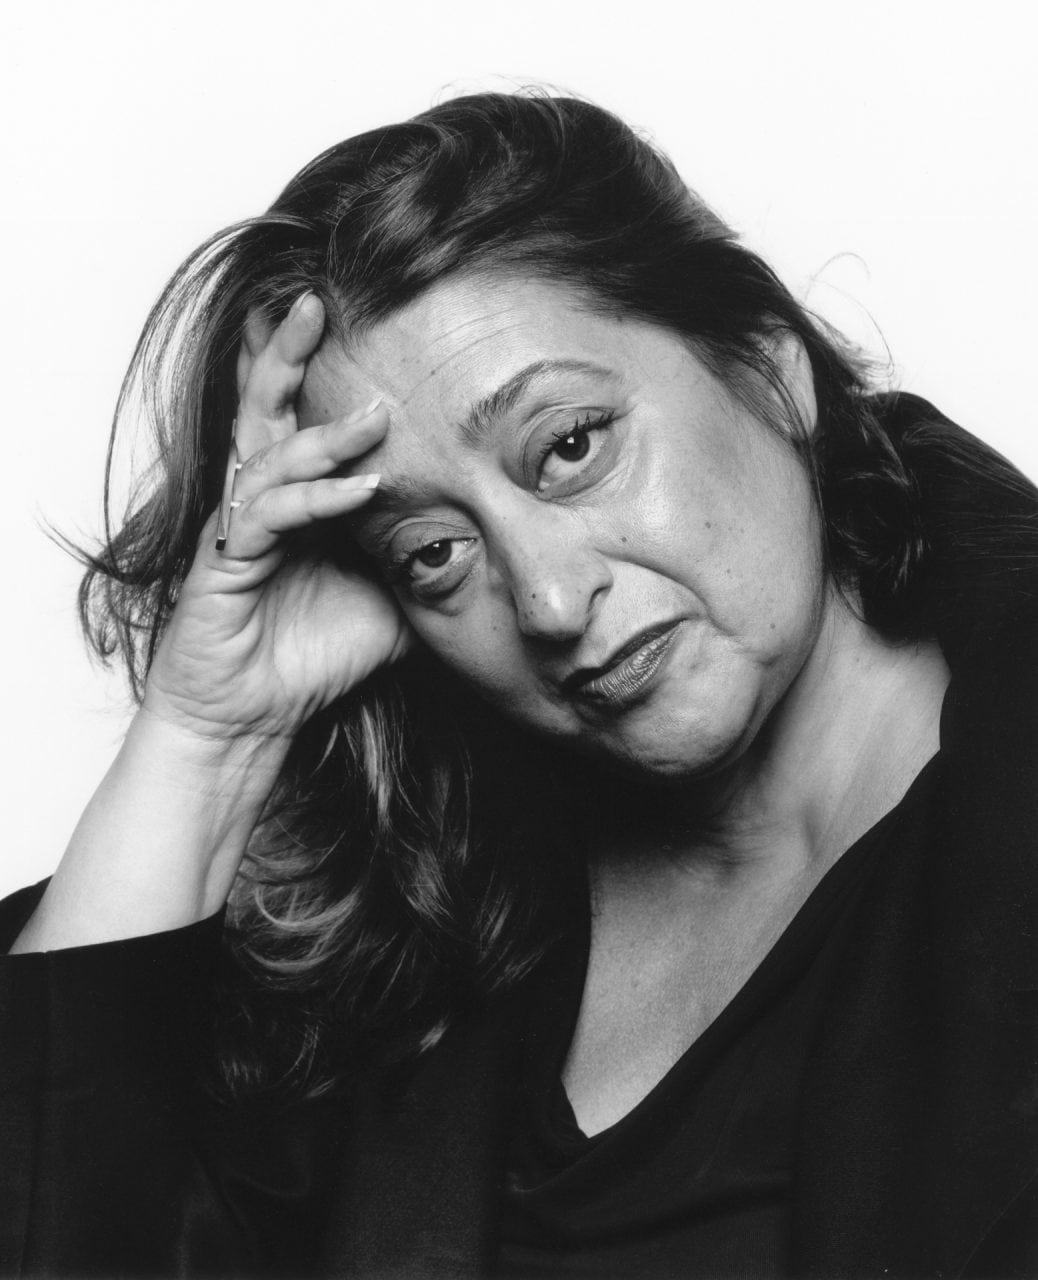 Zaha HadidValerie Bennett 2002  - Zaha Hadid – Expresia geniului in Futurism